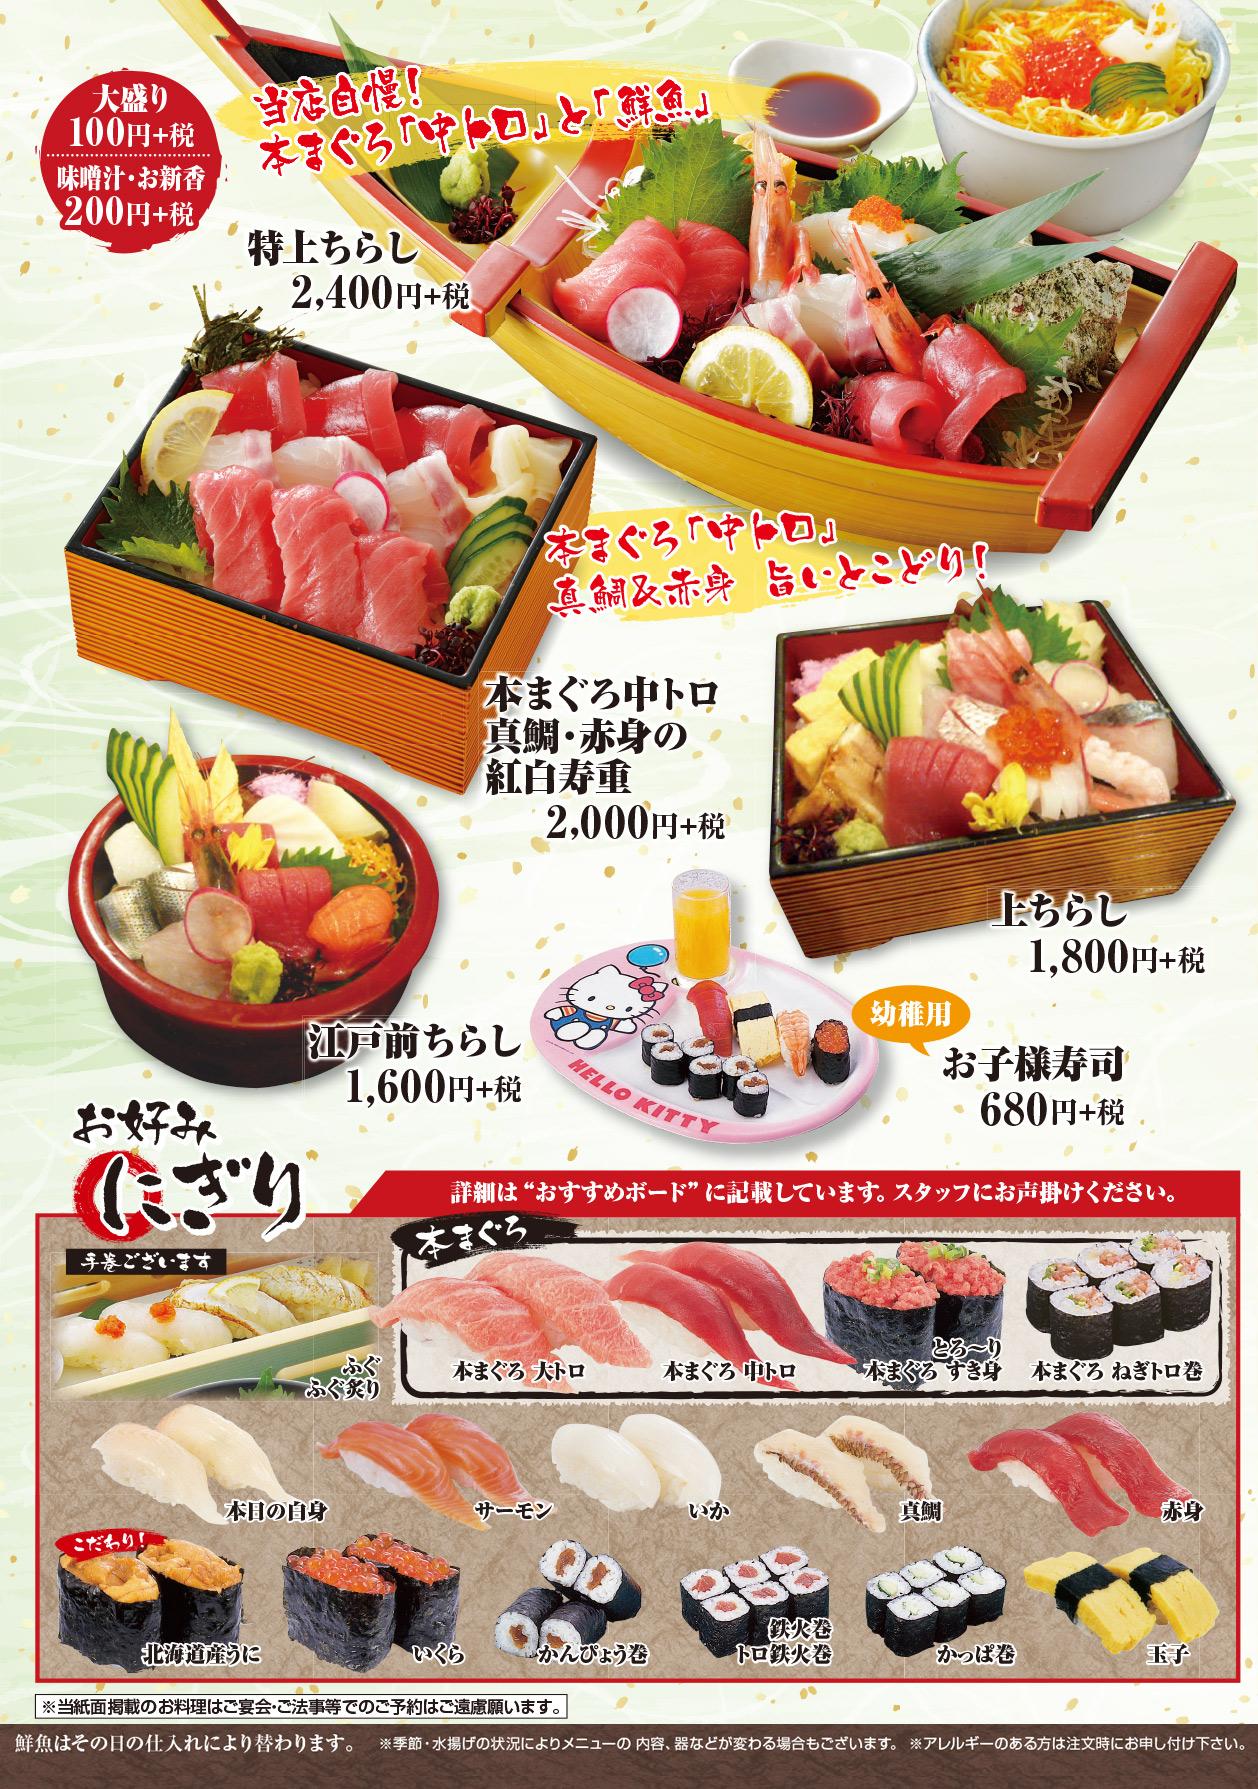 Sushi Dining やよい 湘南台店 グランドメニュー